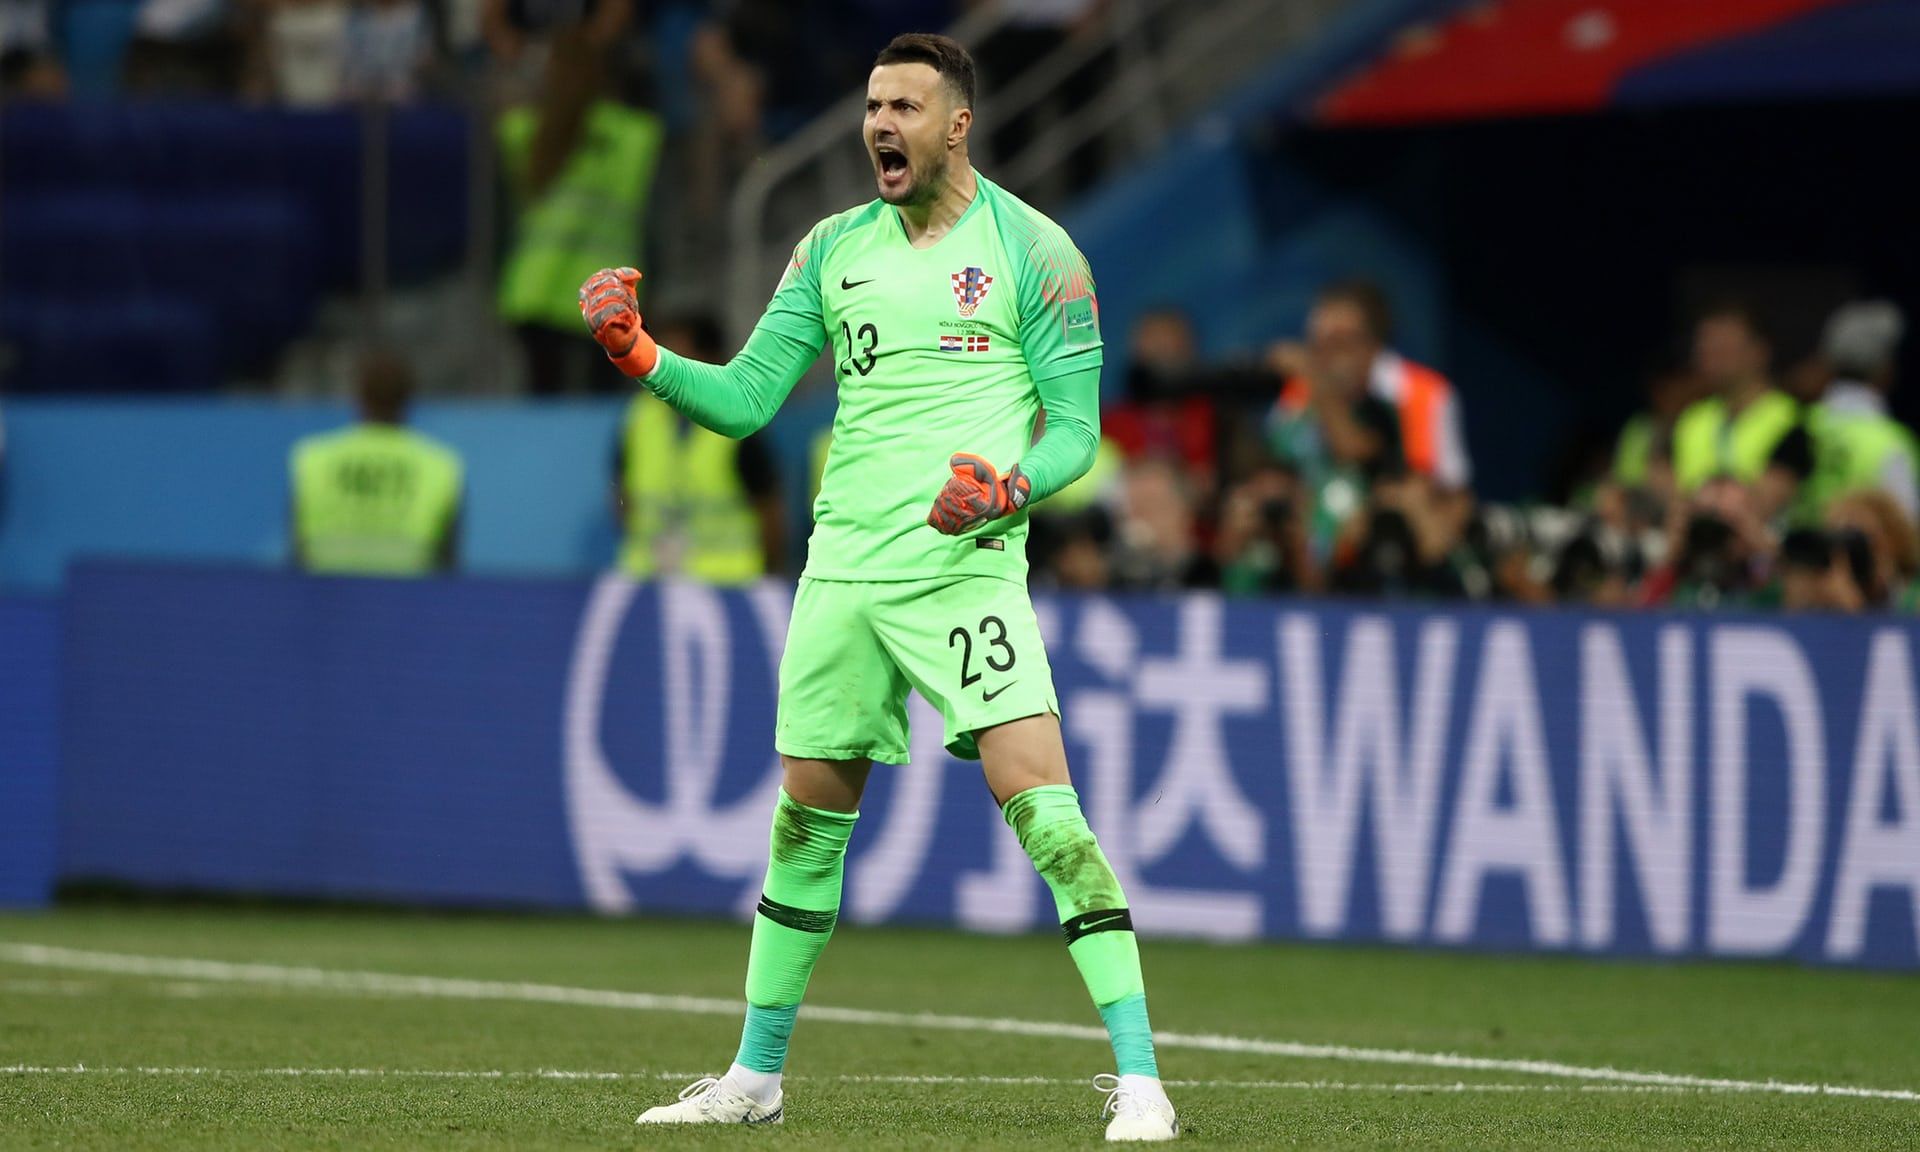 Croatia 1(3)-1(2) Denmark - Croatians set up quarter-final against Russia despite Kasper Schmeichel heroics